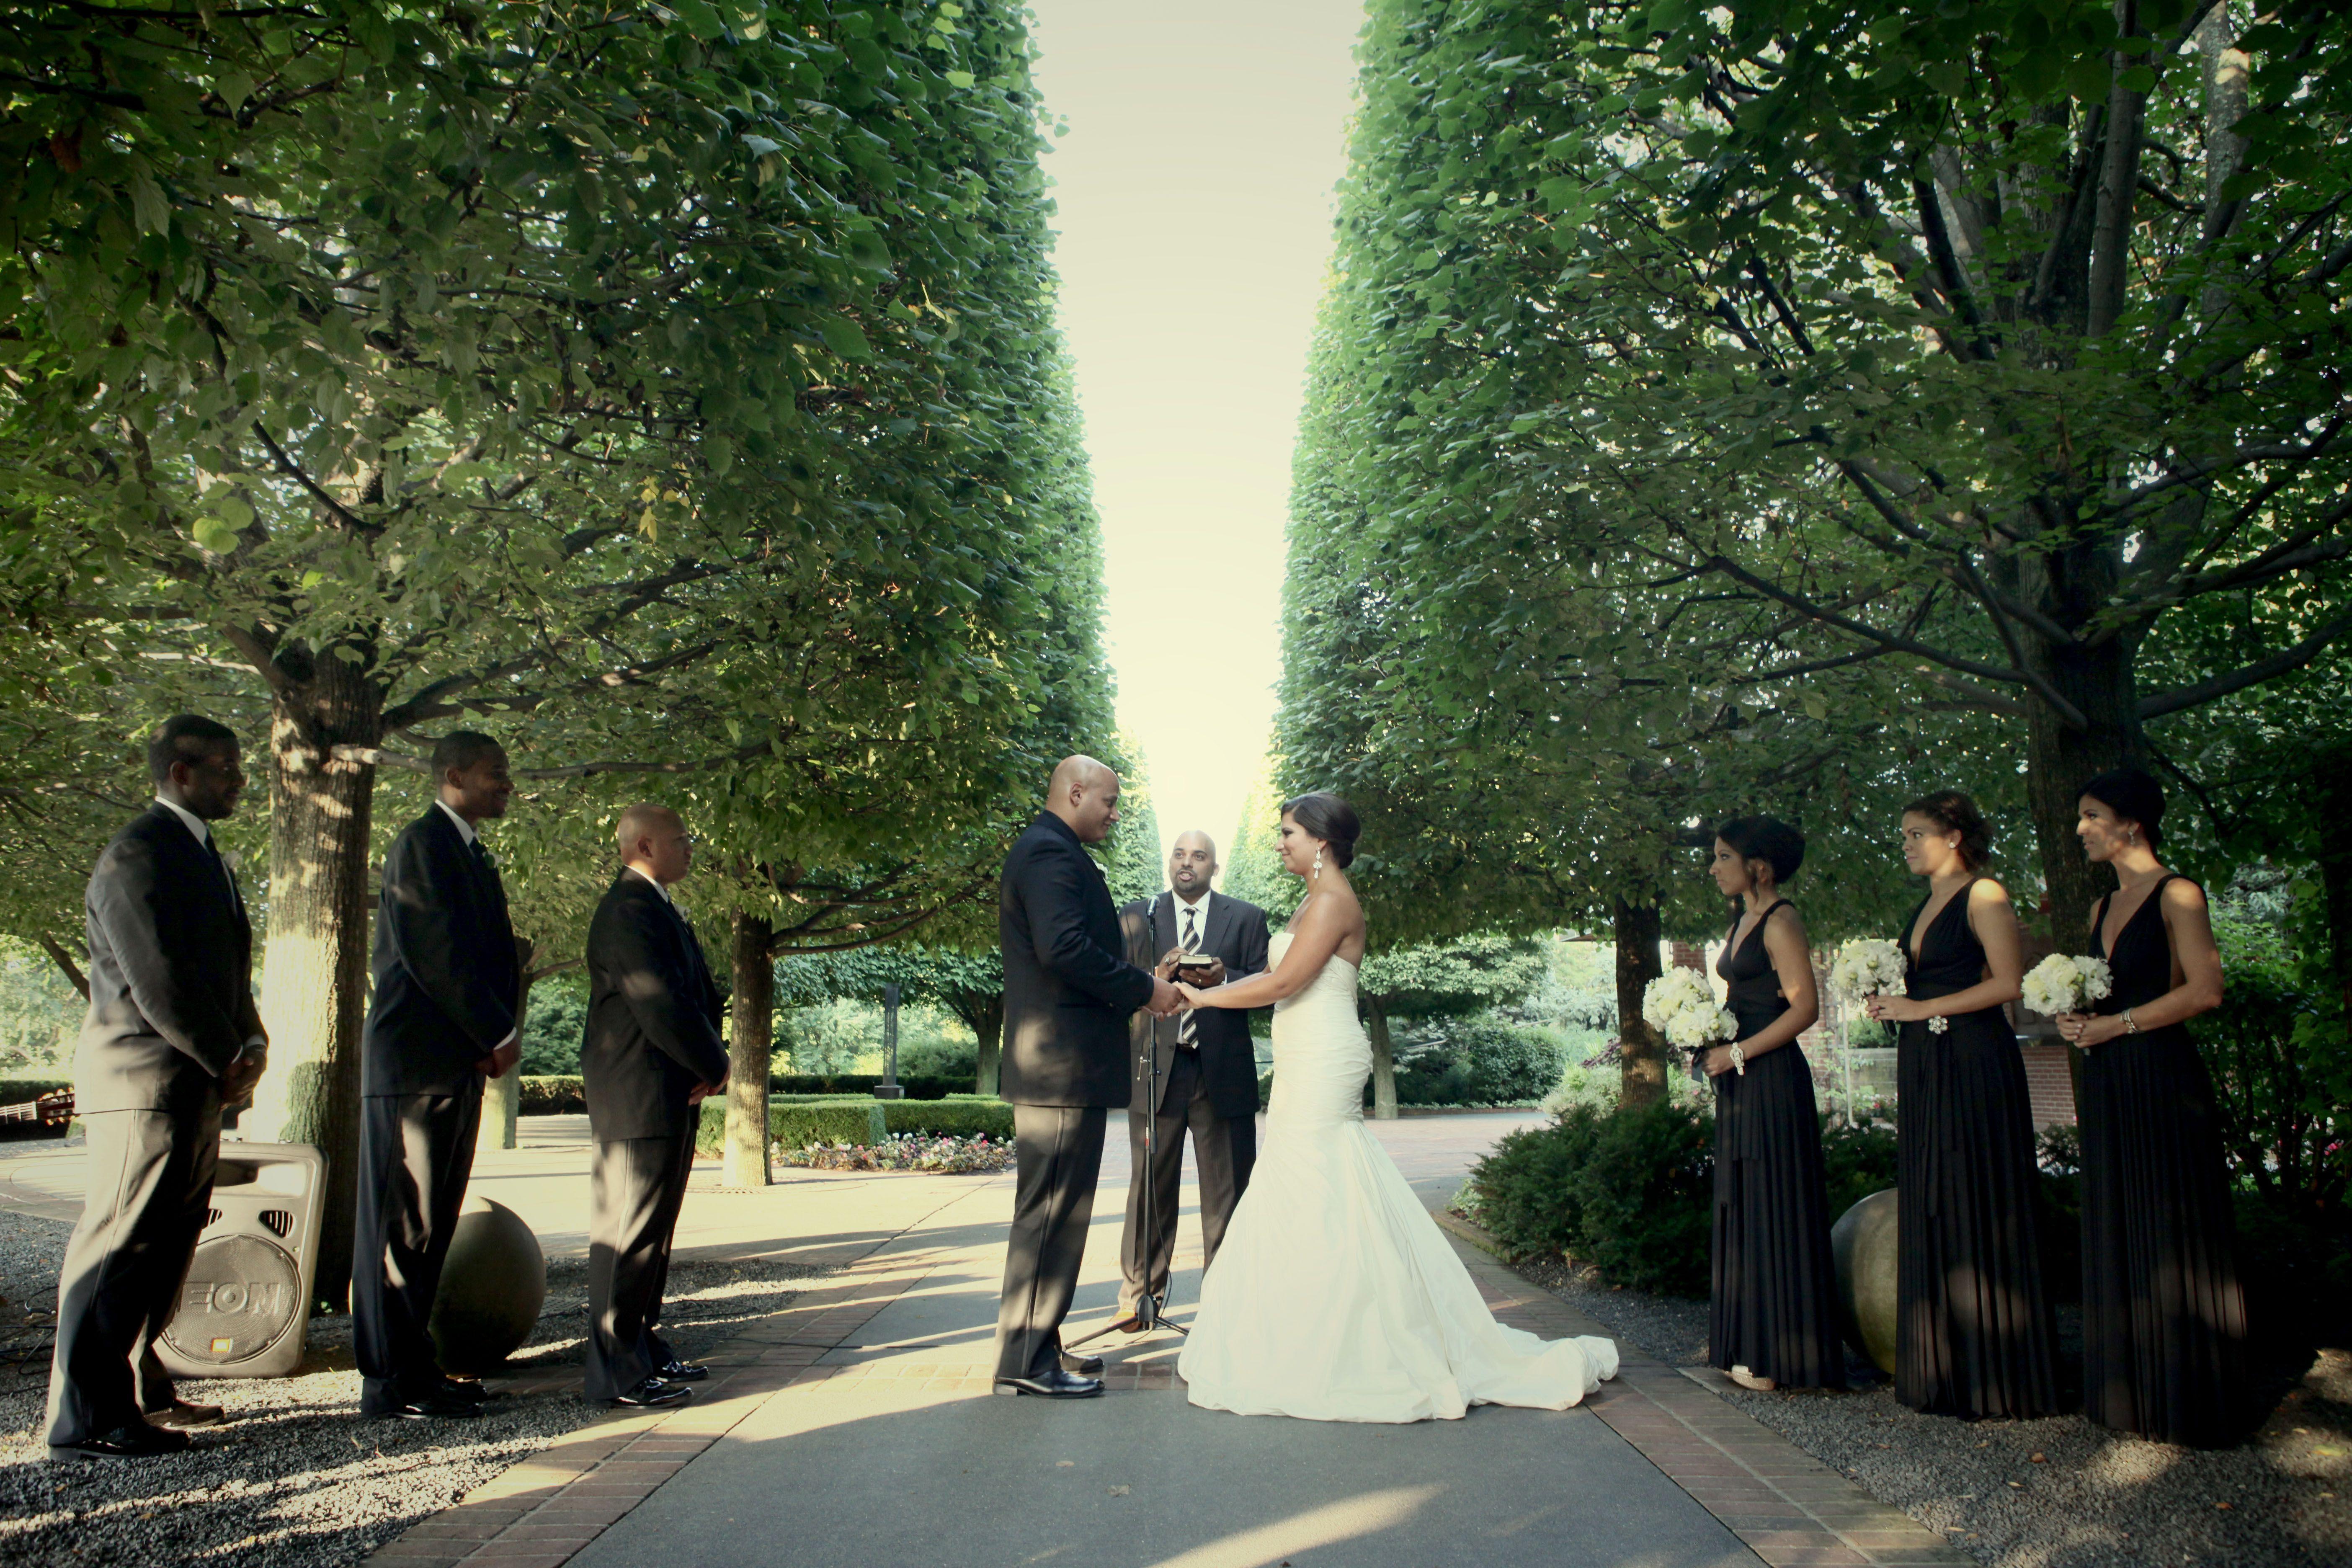 Wedding At The Chicago Botanic Garden Weddings And Events Pinterest Wedding Rehearsal